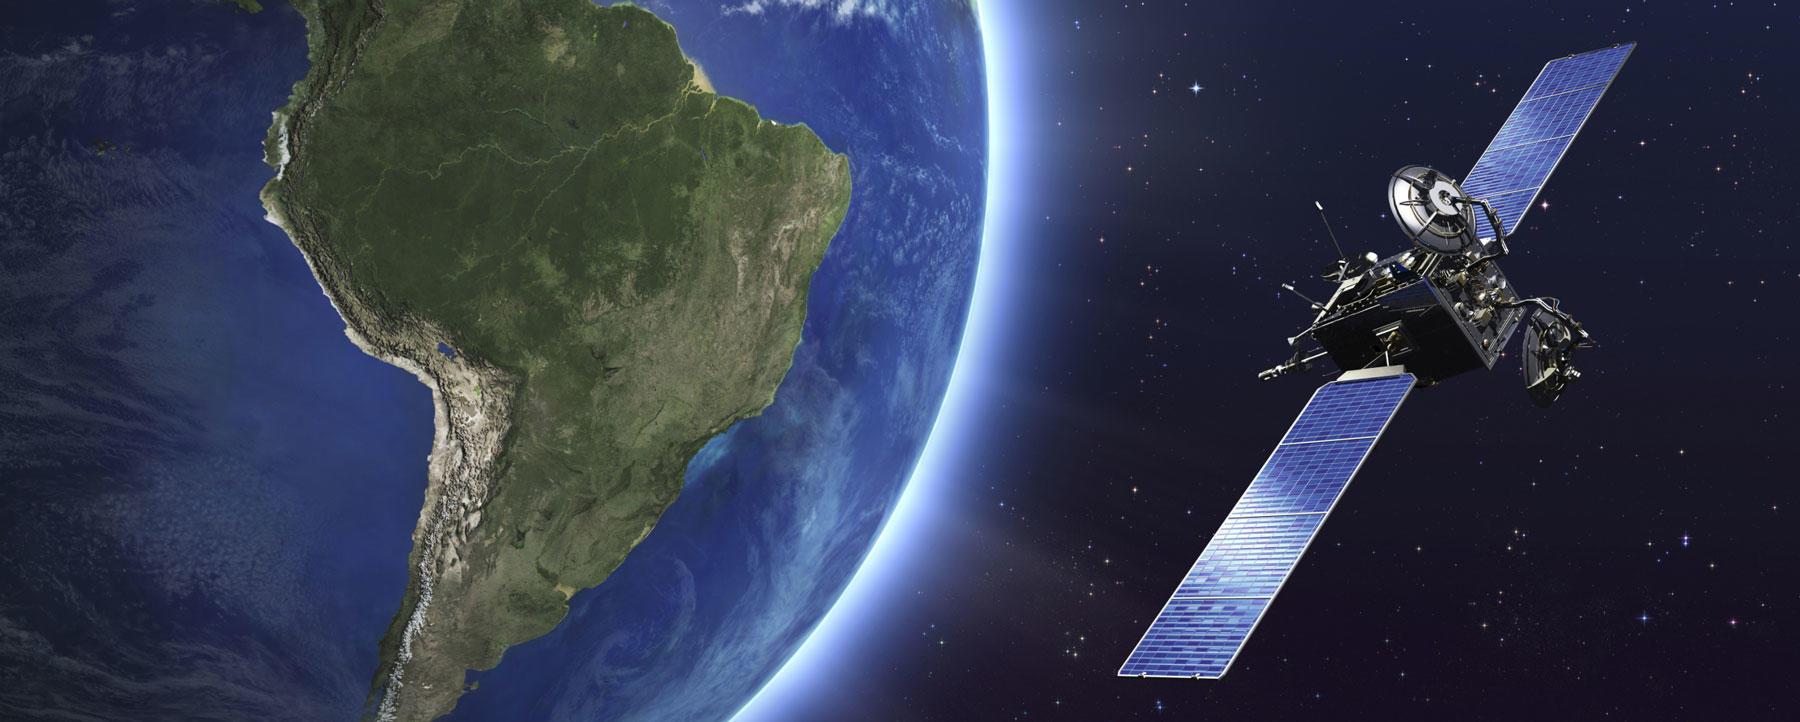 Telecommunication satellite orbiting Earth.